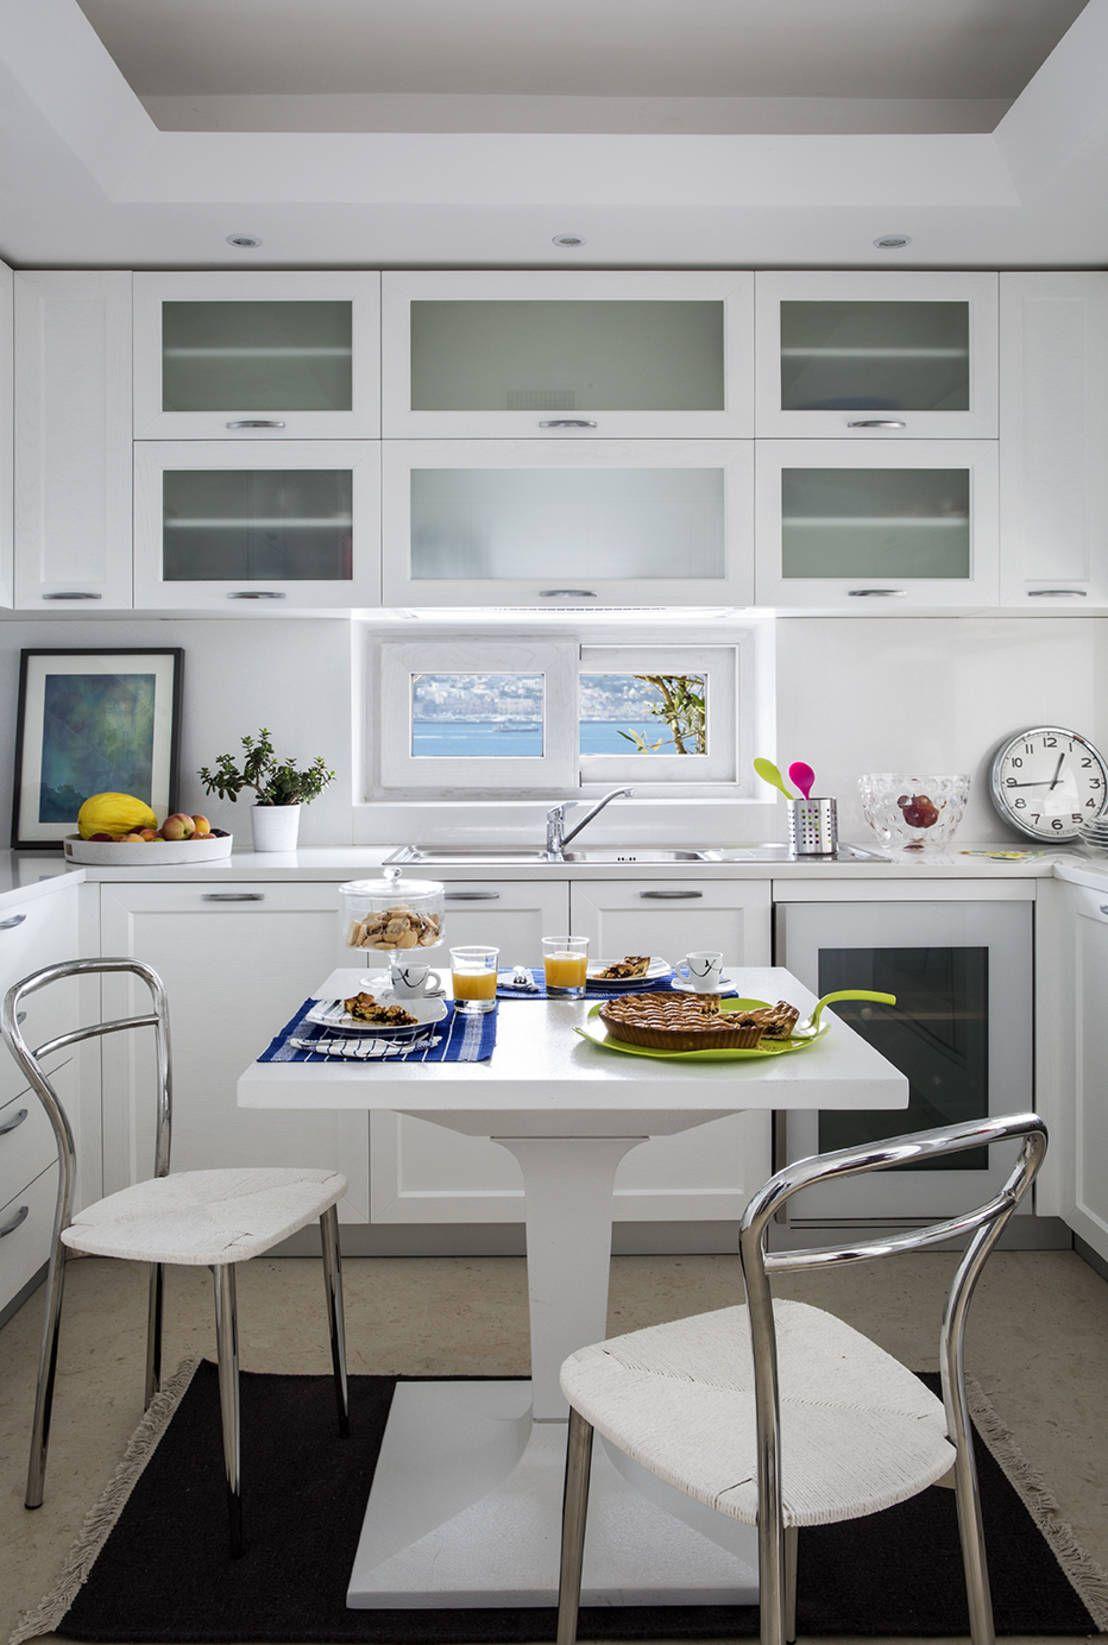 6 Brillanti Idee per Arredare una Cucina Stretta e Lunga   Pinterest